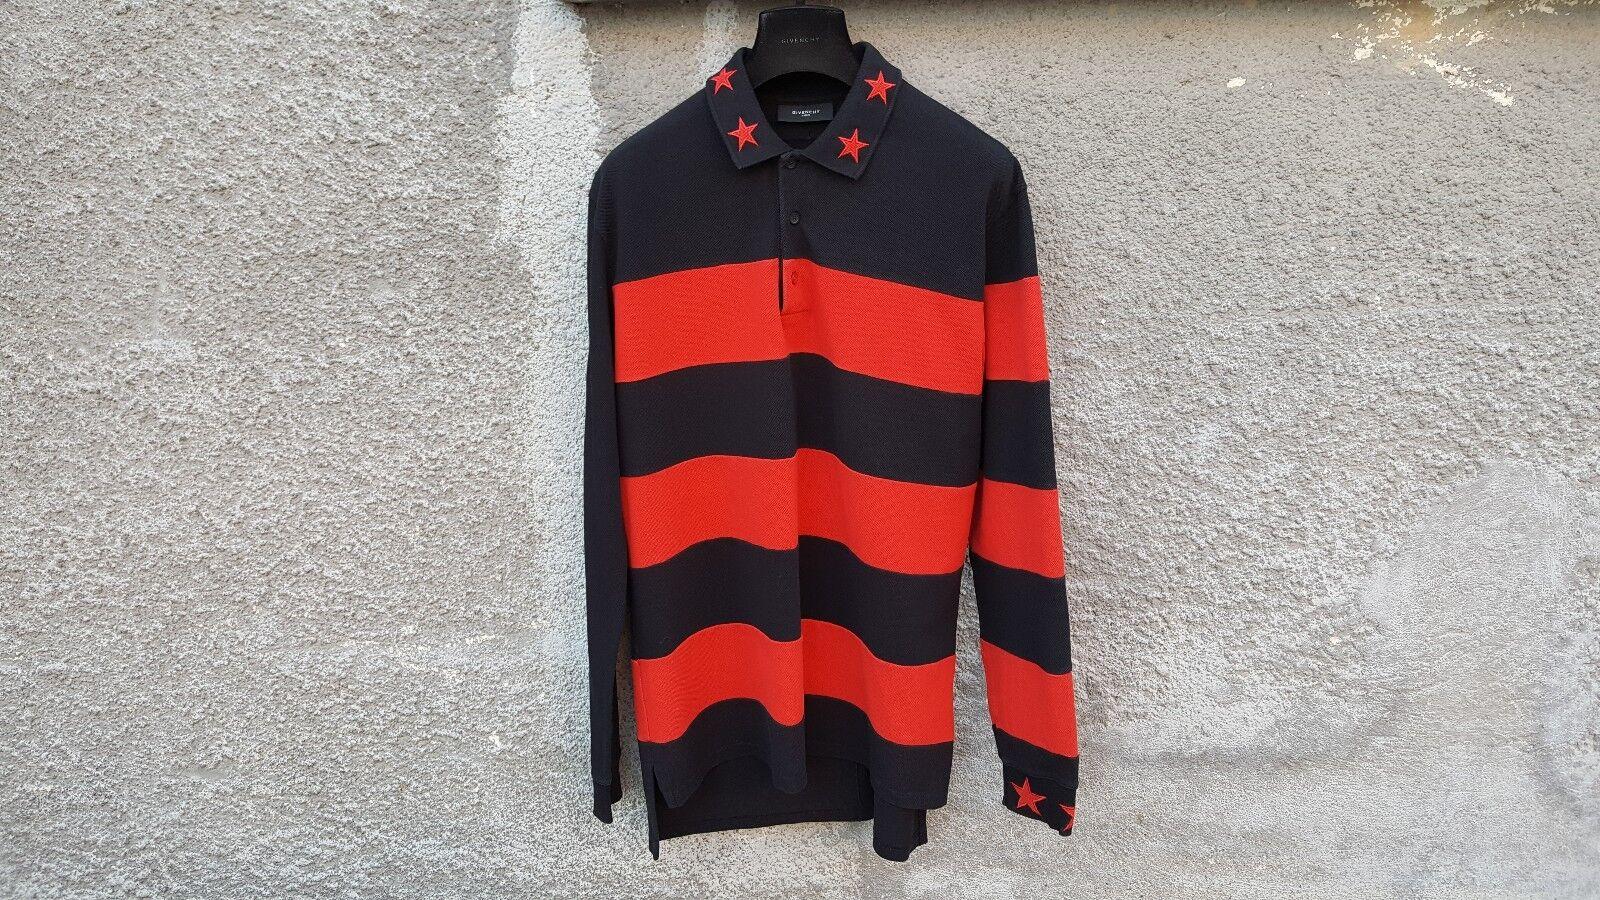 Givenchy Striped Star Embroiderot Rottweiler OverGrößed Polo hemd Größe M (L XL)